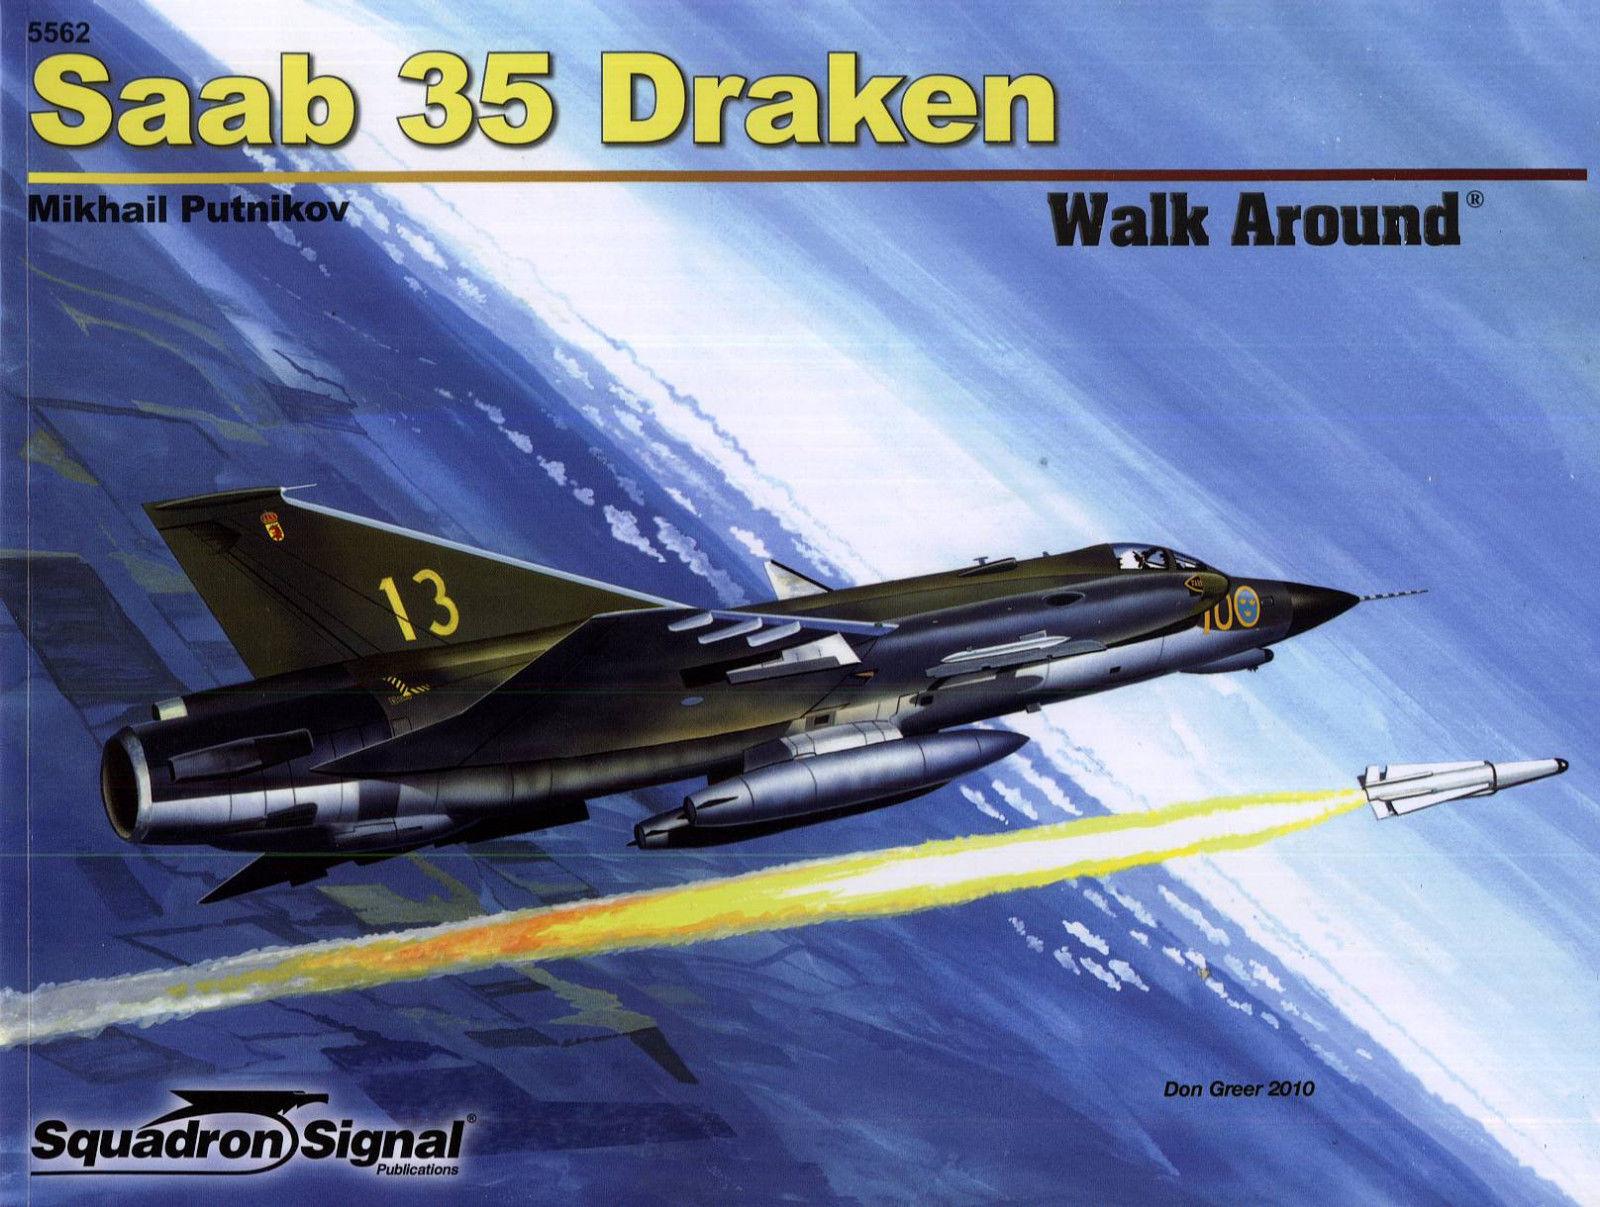 SAAB 35 DRAKEN-SQUADRON SIGNAL WALK AROUND AROUND AROUND Color SERIES N.5562-BY MIKH.PUTNIKOV fc4e6f